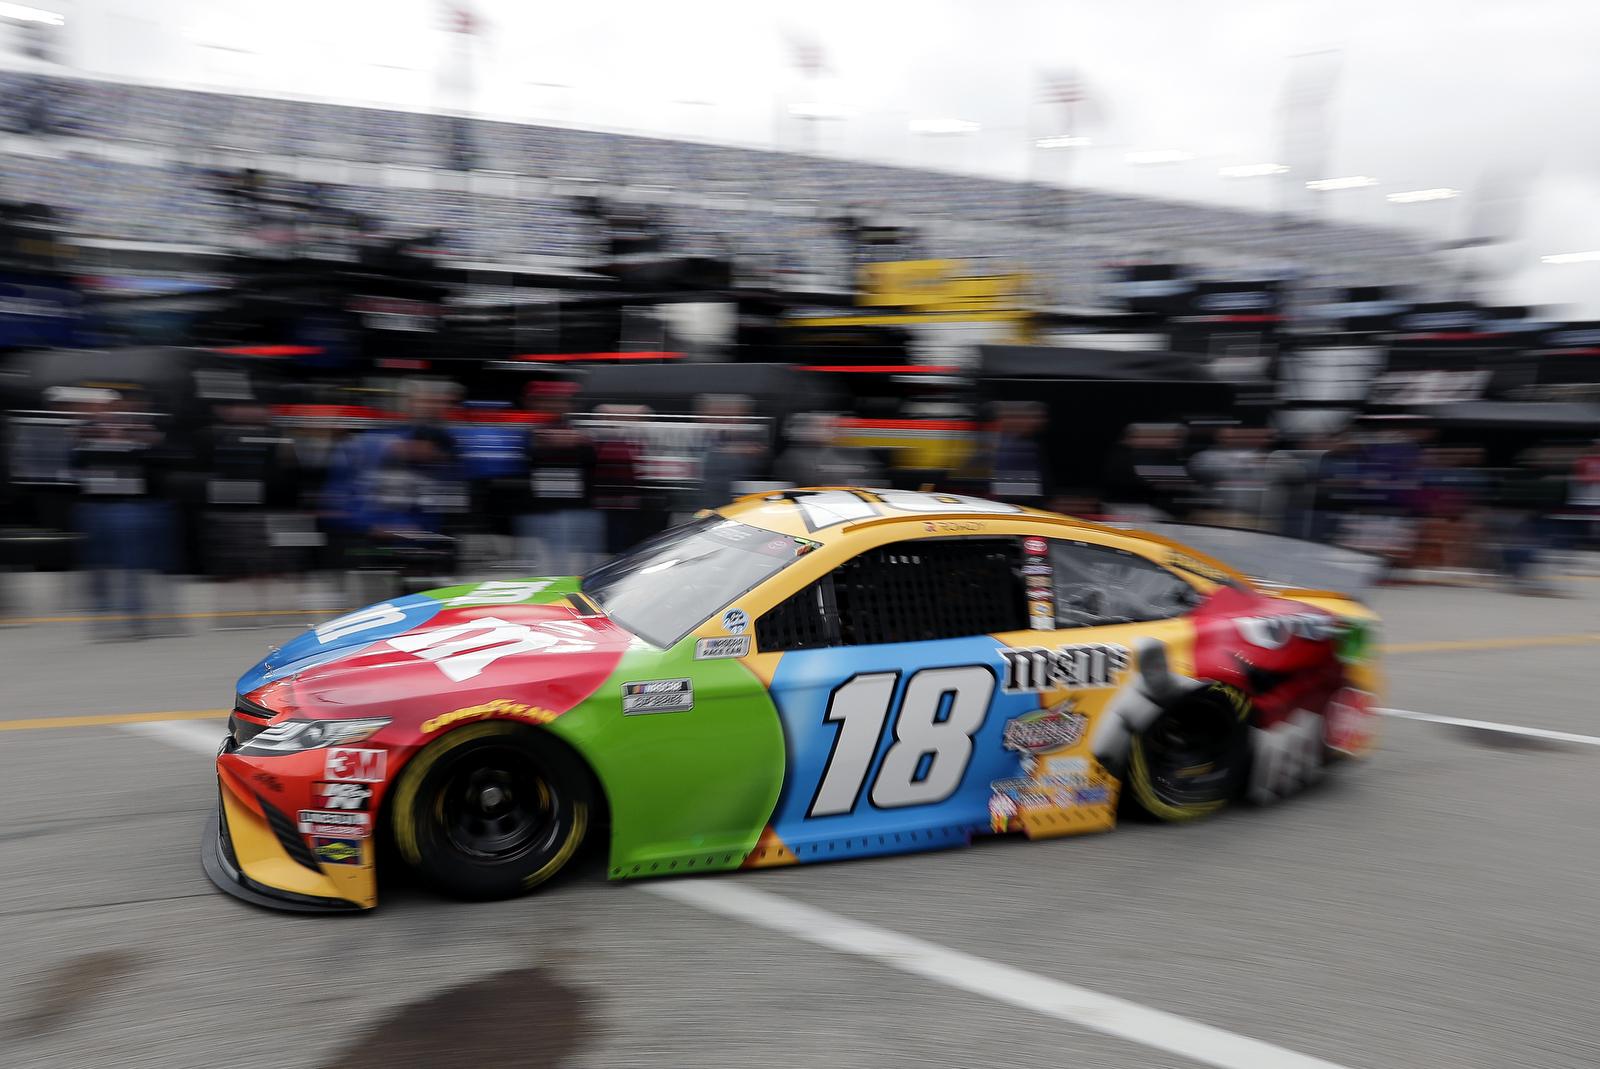 Kyle Busch heads to the track to practice for the NASCAR Daytona 500 auto race at Daytona International Speedway, Friday, Feb. 14, 2020, in Daytona Beach, Fla. AP